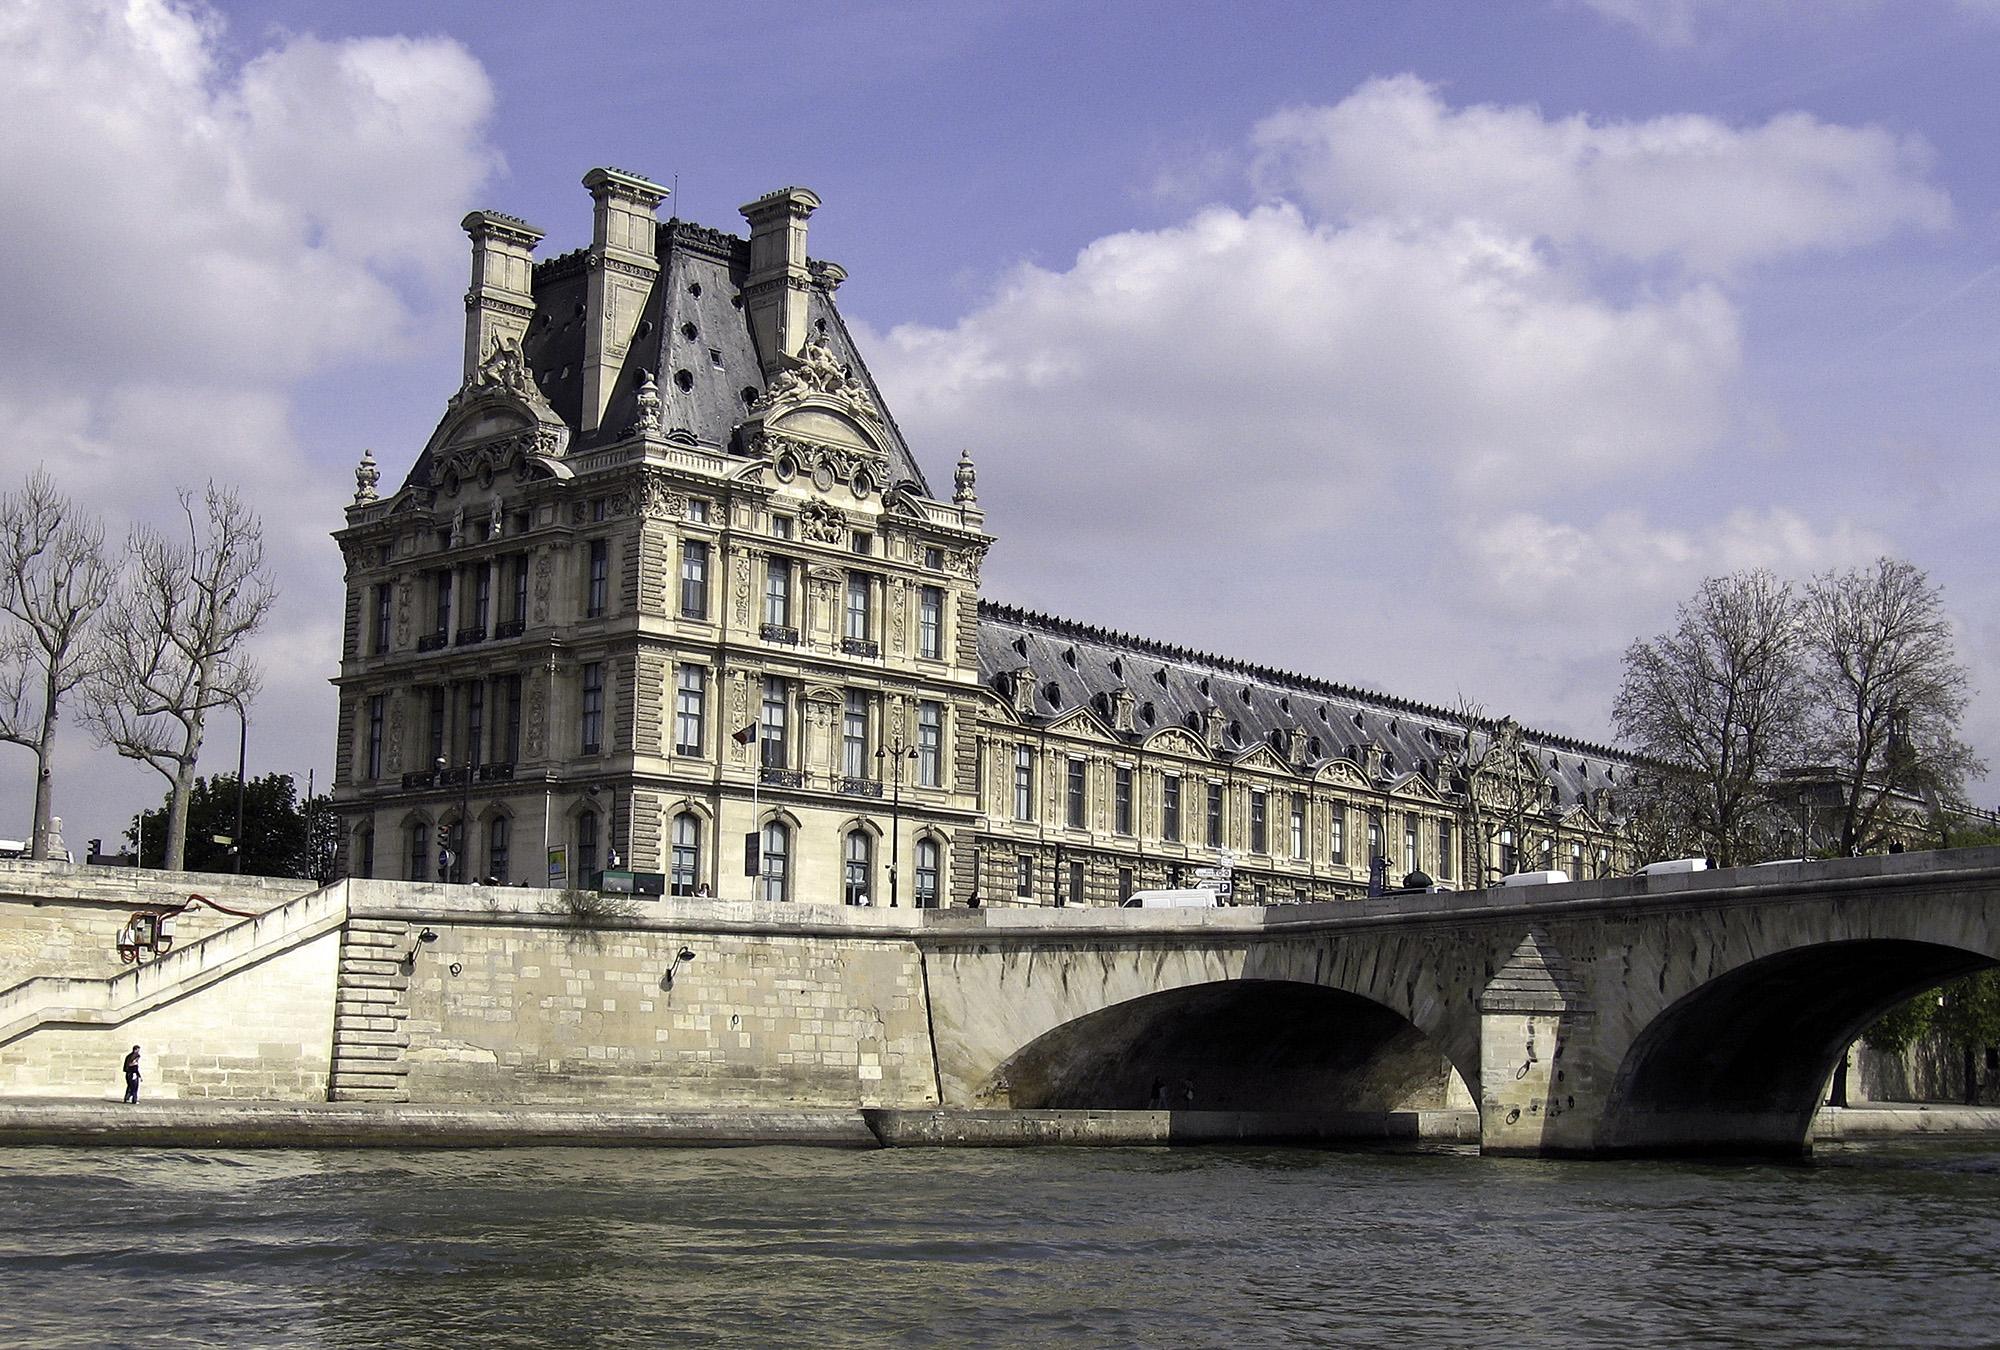 Ecole du Lourve from the River Seine